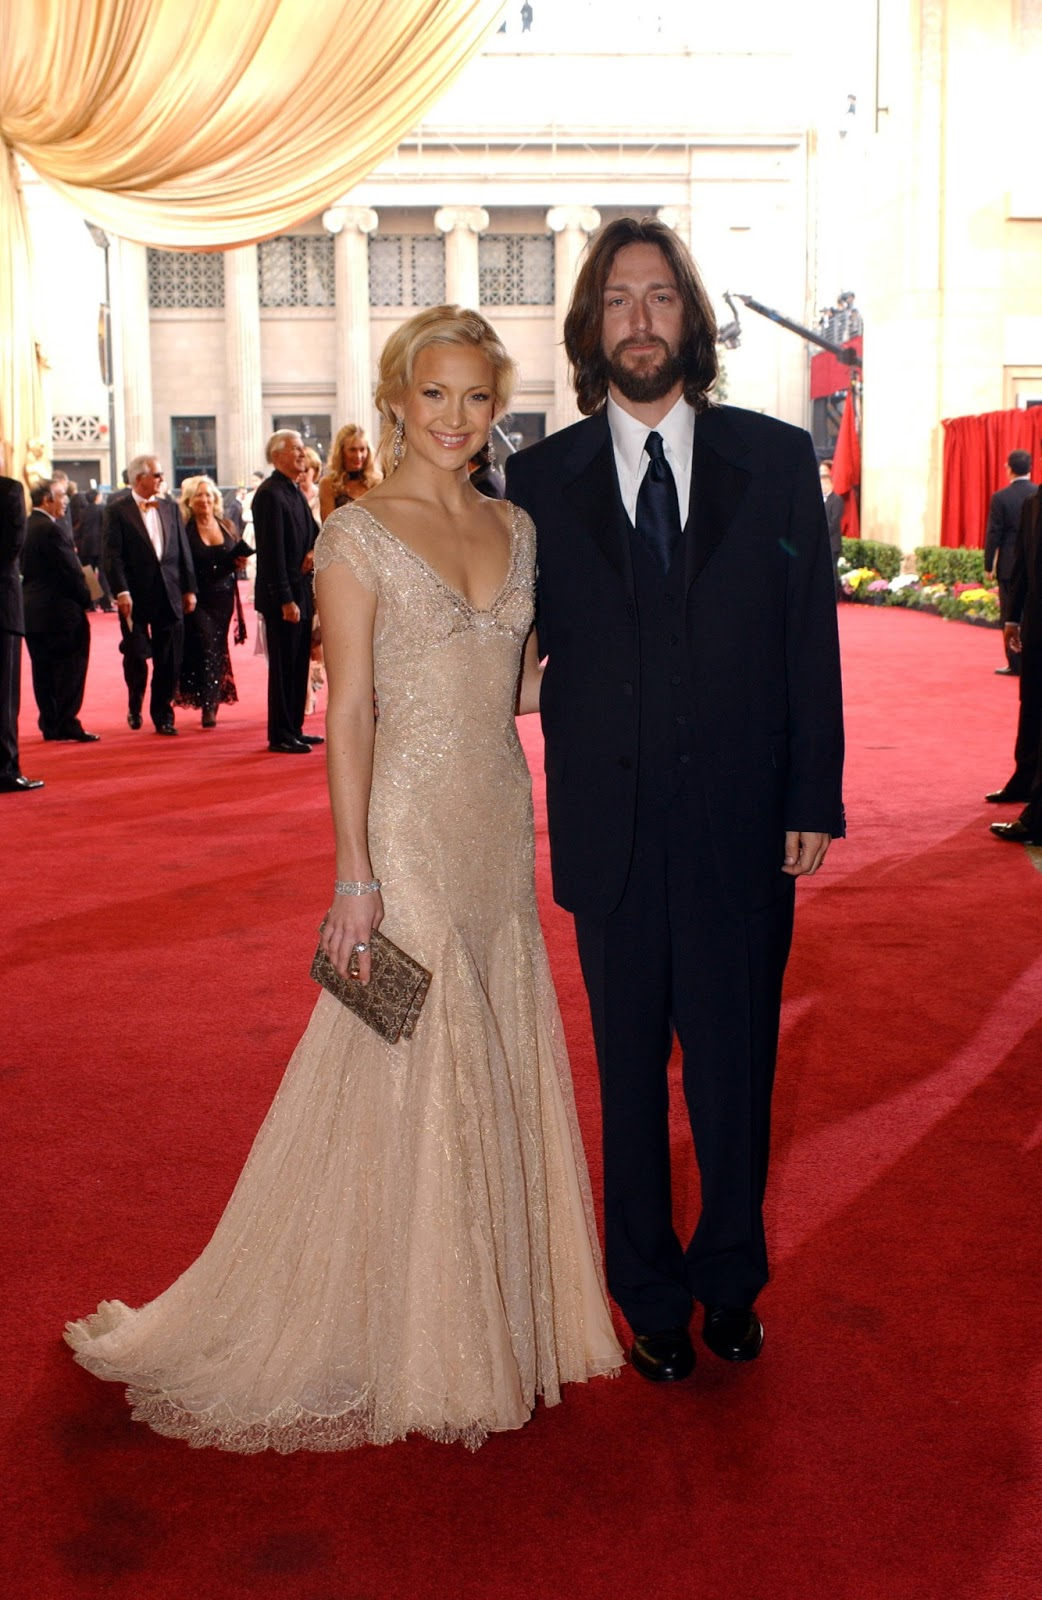 http://2.bp.blogspot.com/-fn3ZM_-HvPk/UPbqSBM6tuI/AAAAAAAAL4o/I-QTa04ZbW8/s1600/Kate+Hudson+Kate+Hudson+Chris+Robinson_10.jpg